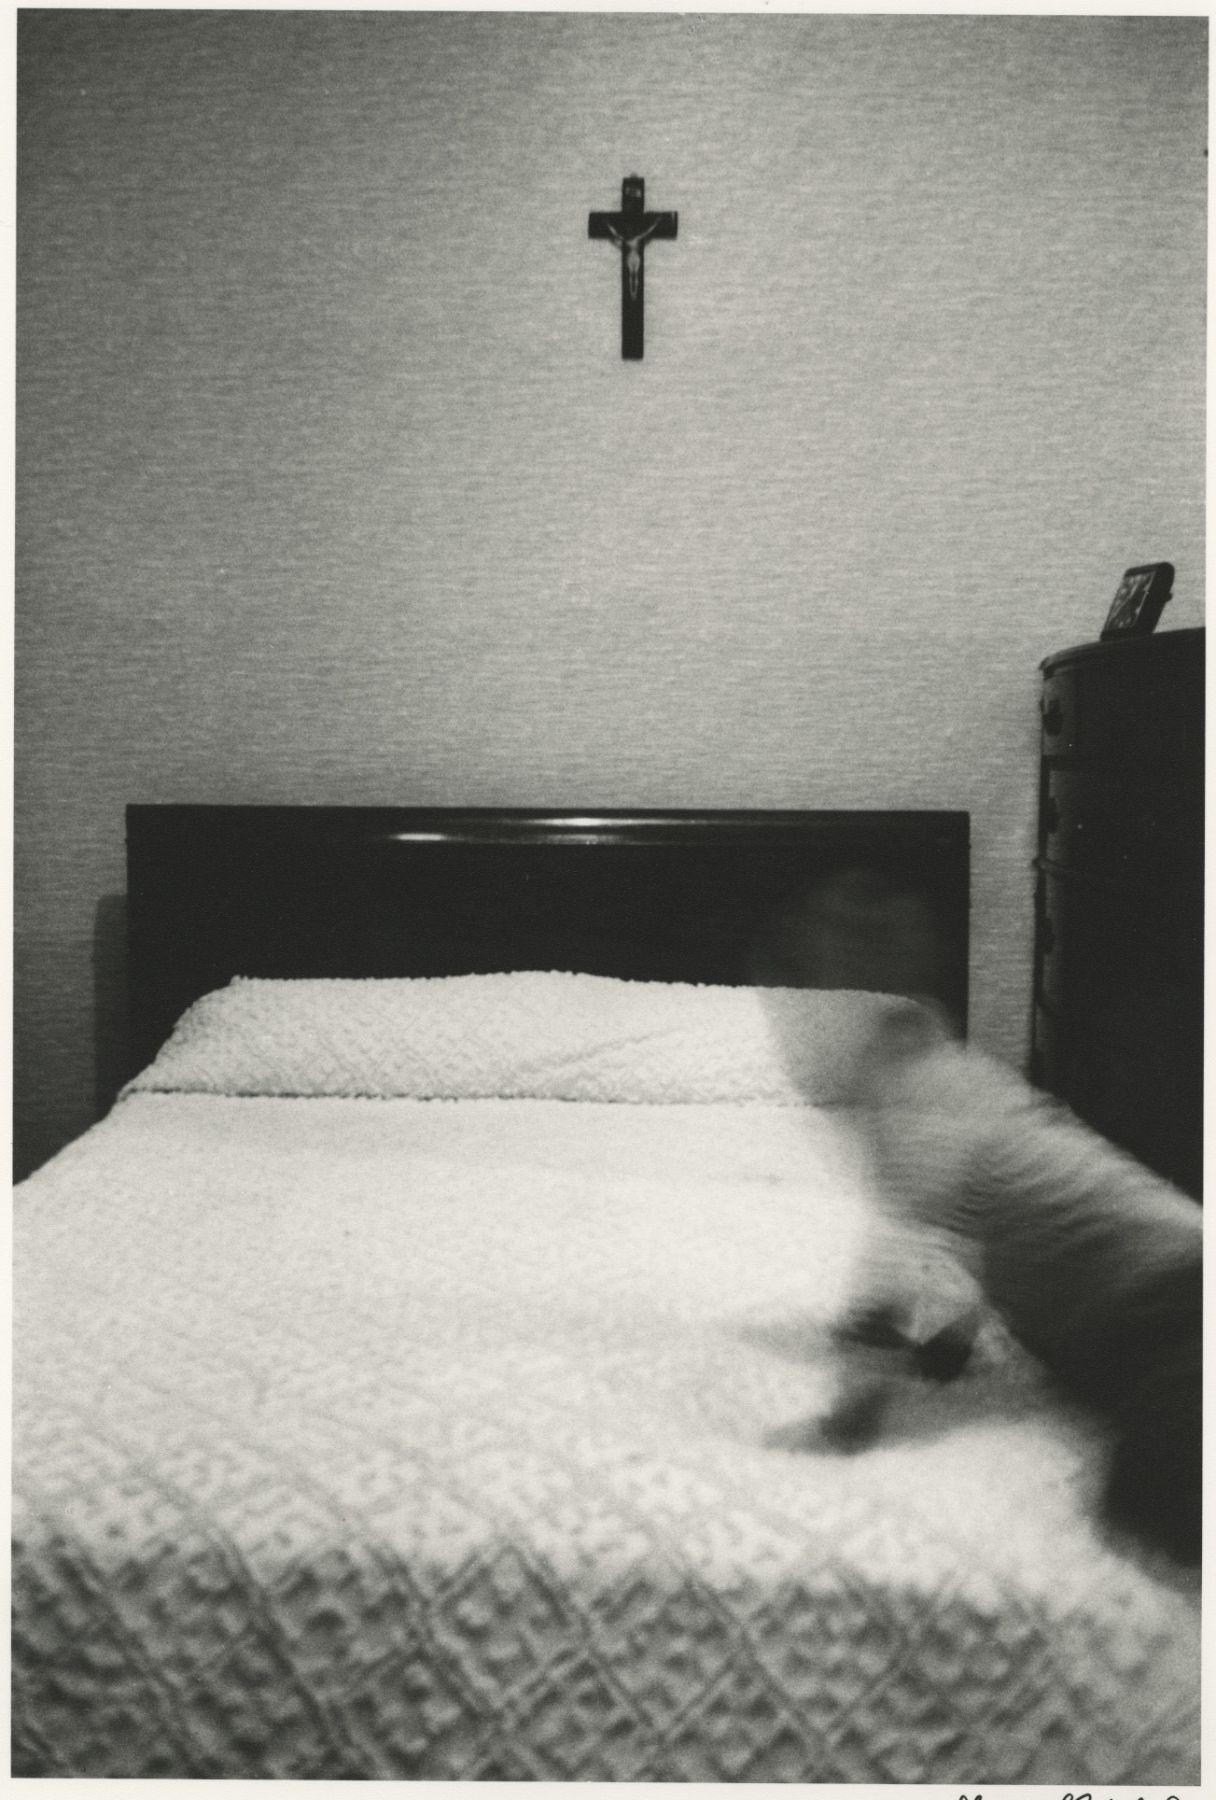 Boy on Bed, Bronx, 1964, Silver Gelatin Photograph